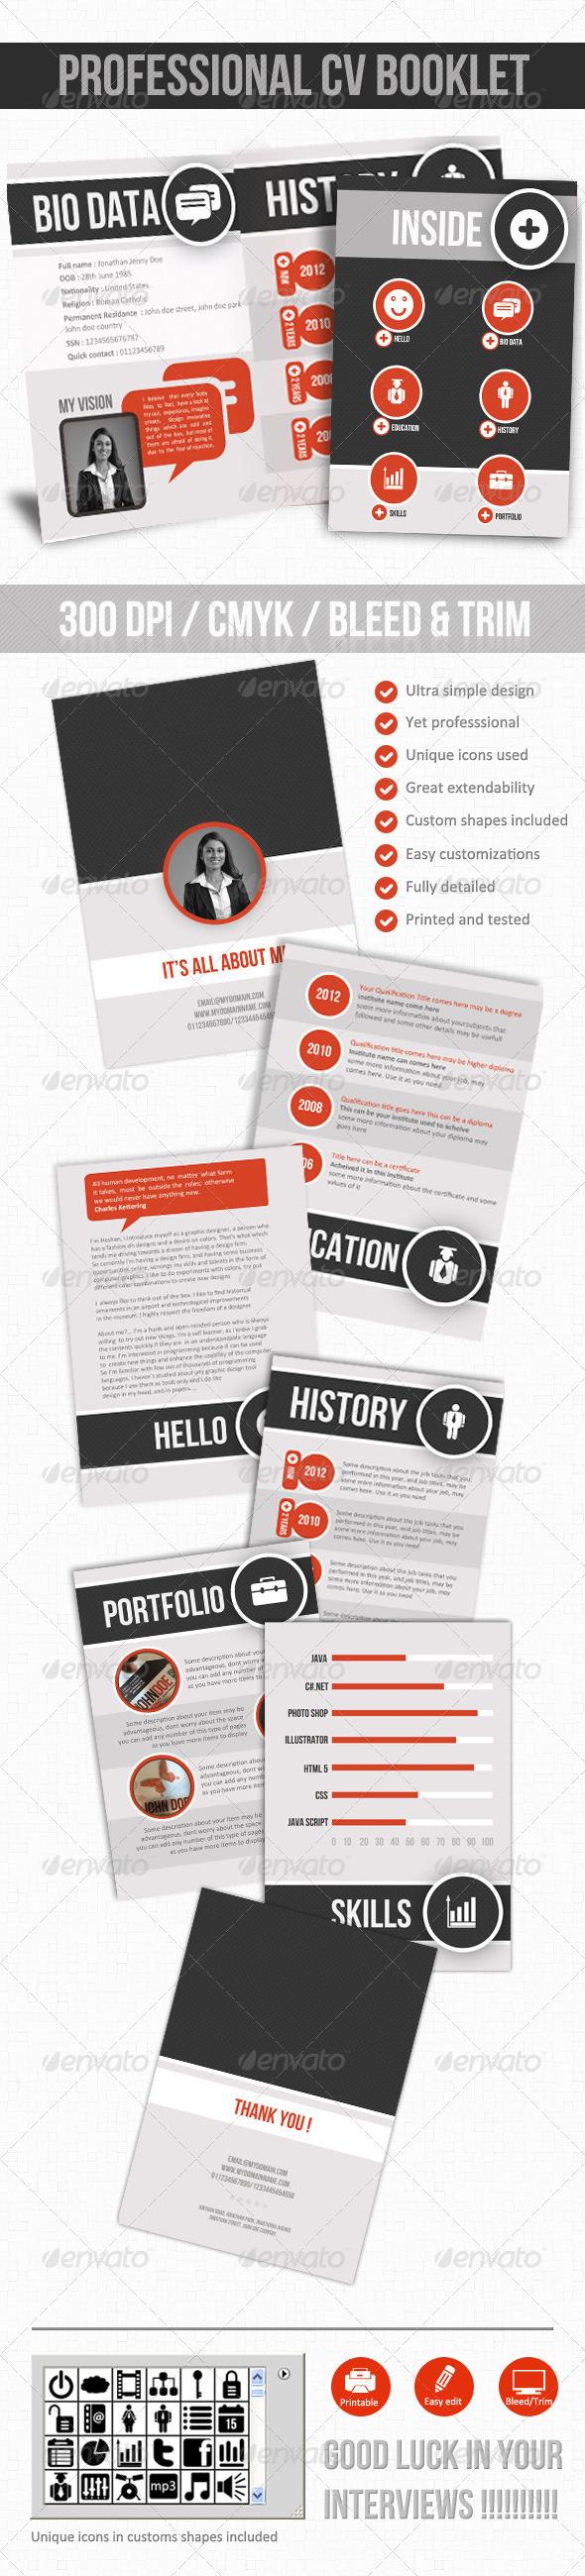 GraphicRiver Professional CV Booklet 2383410